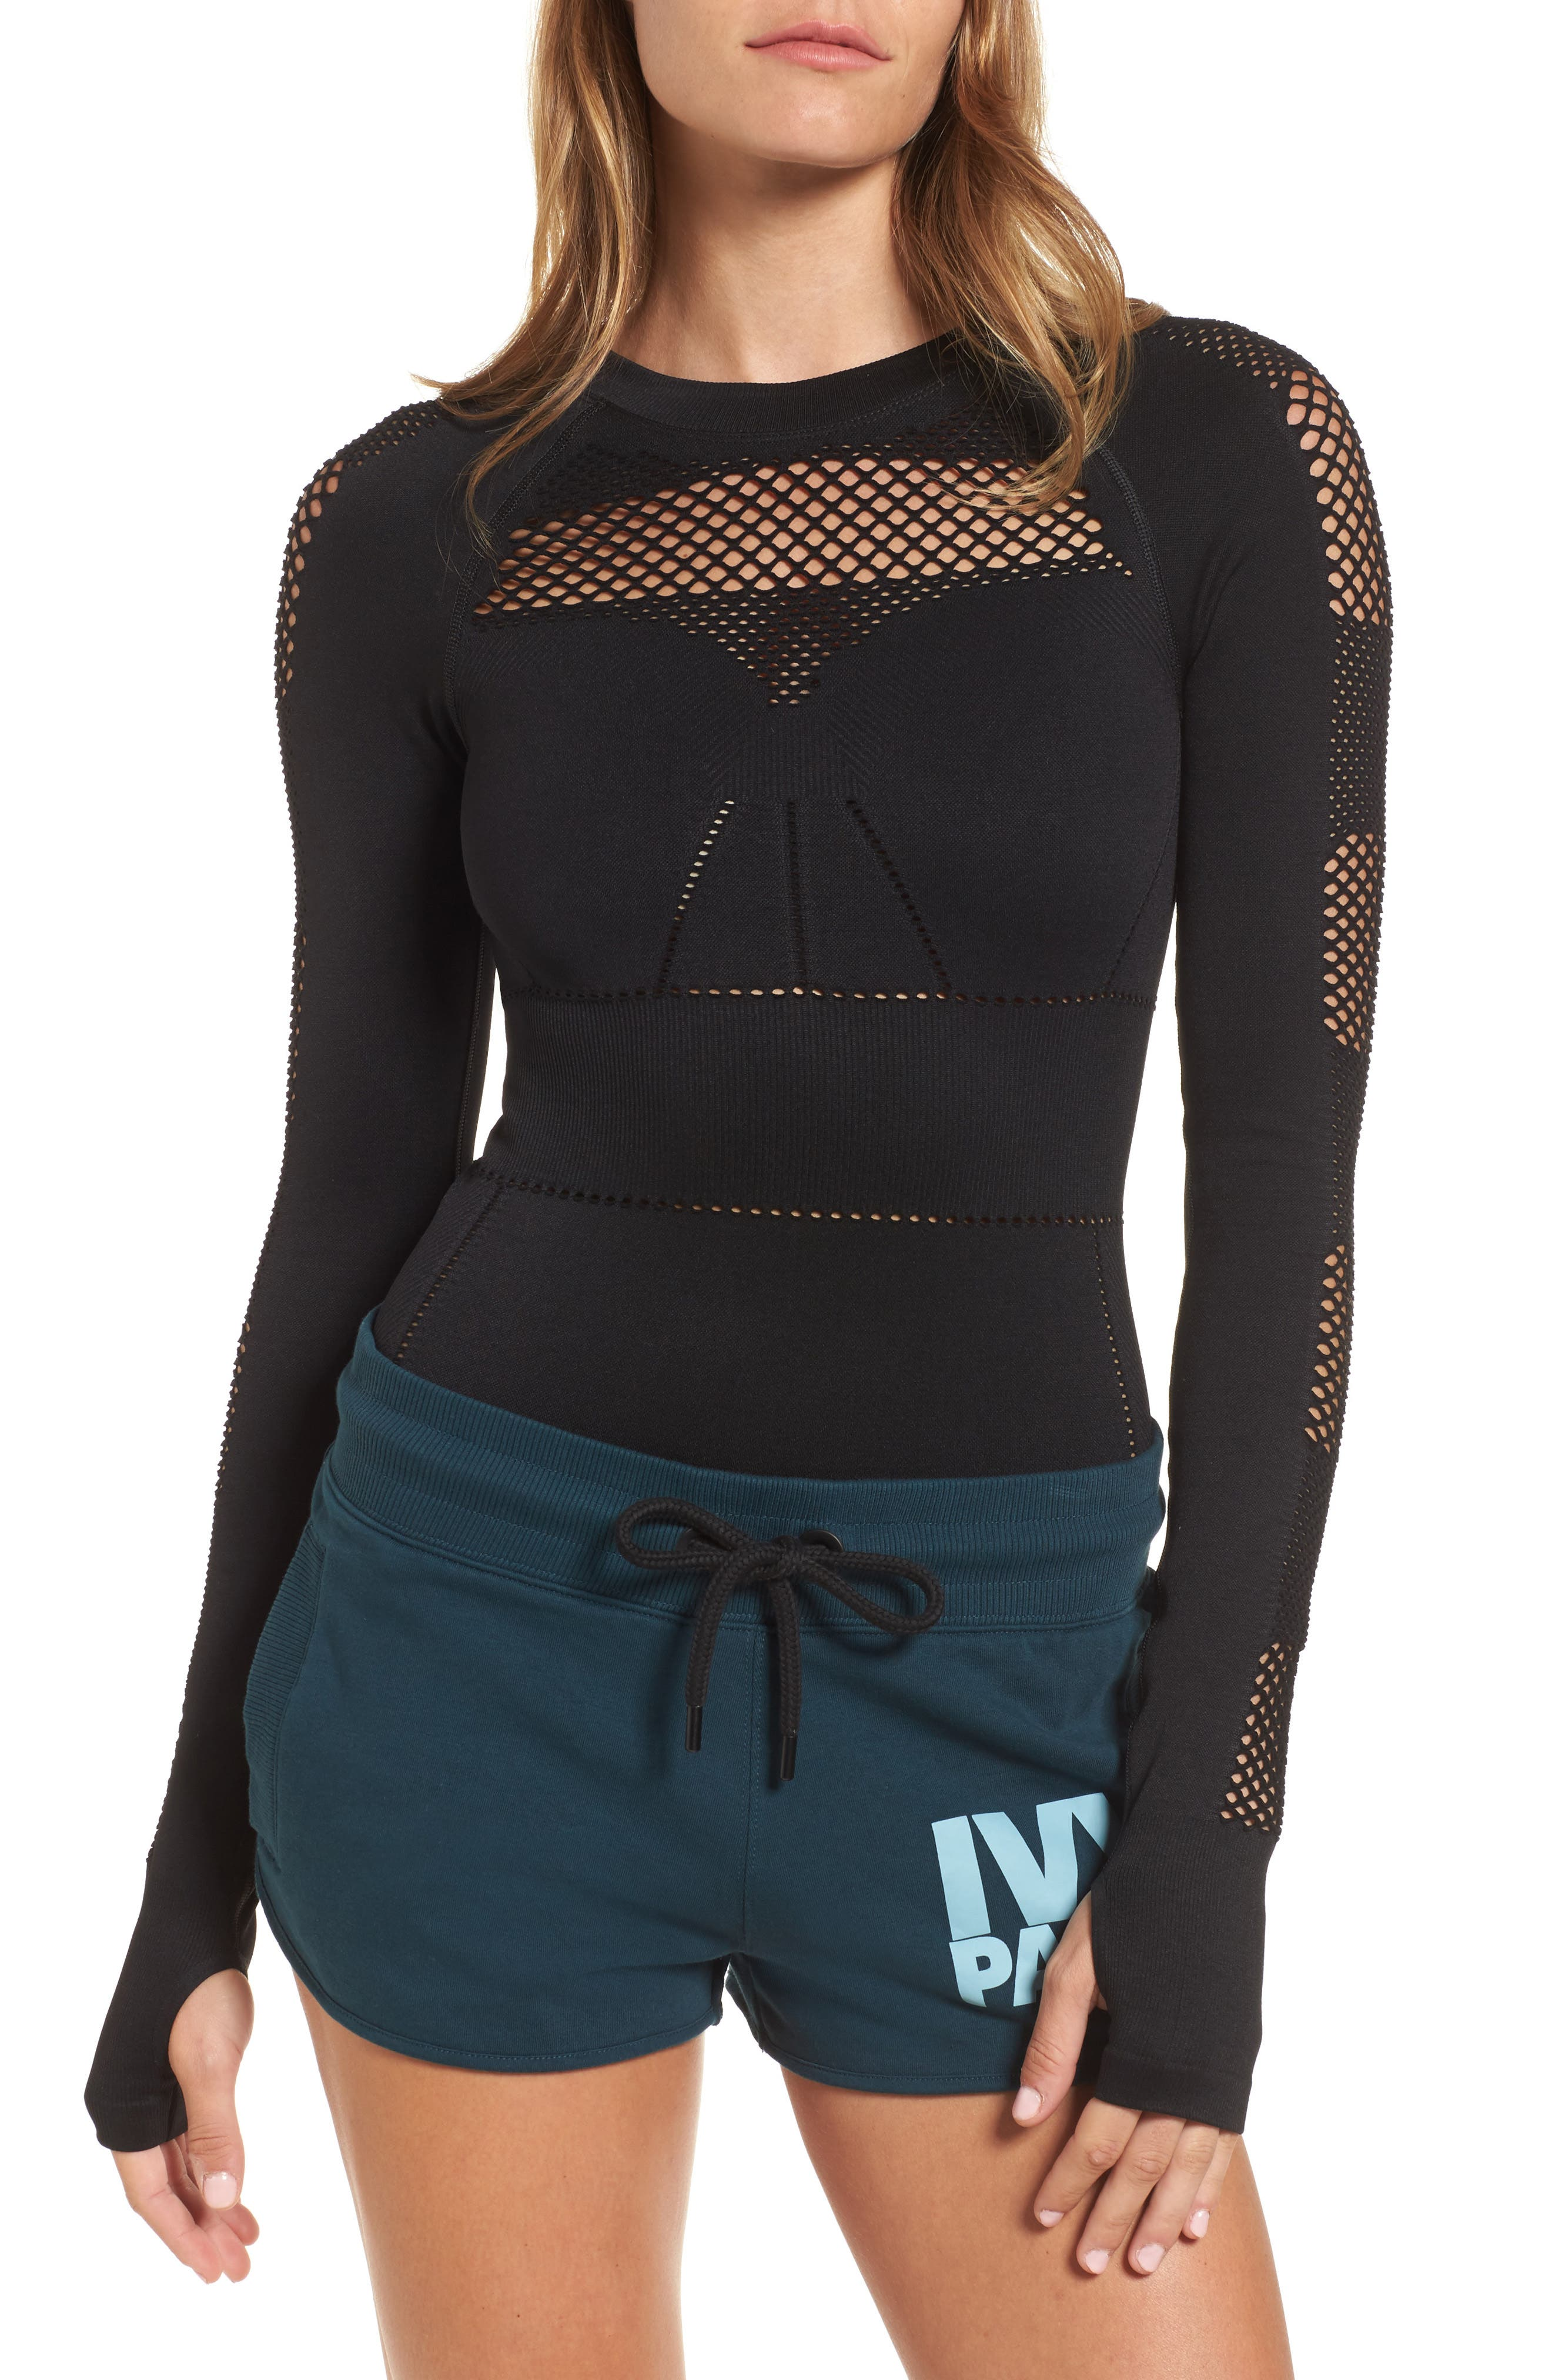 IVY PARK® Net Bodysuit